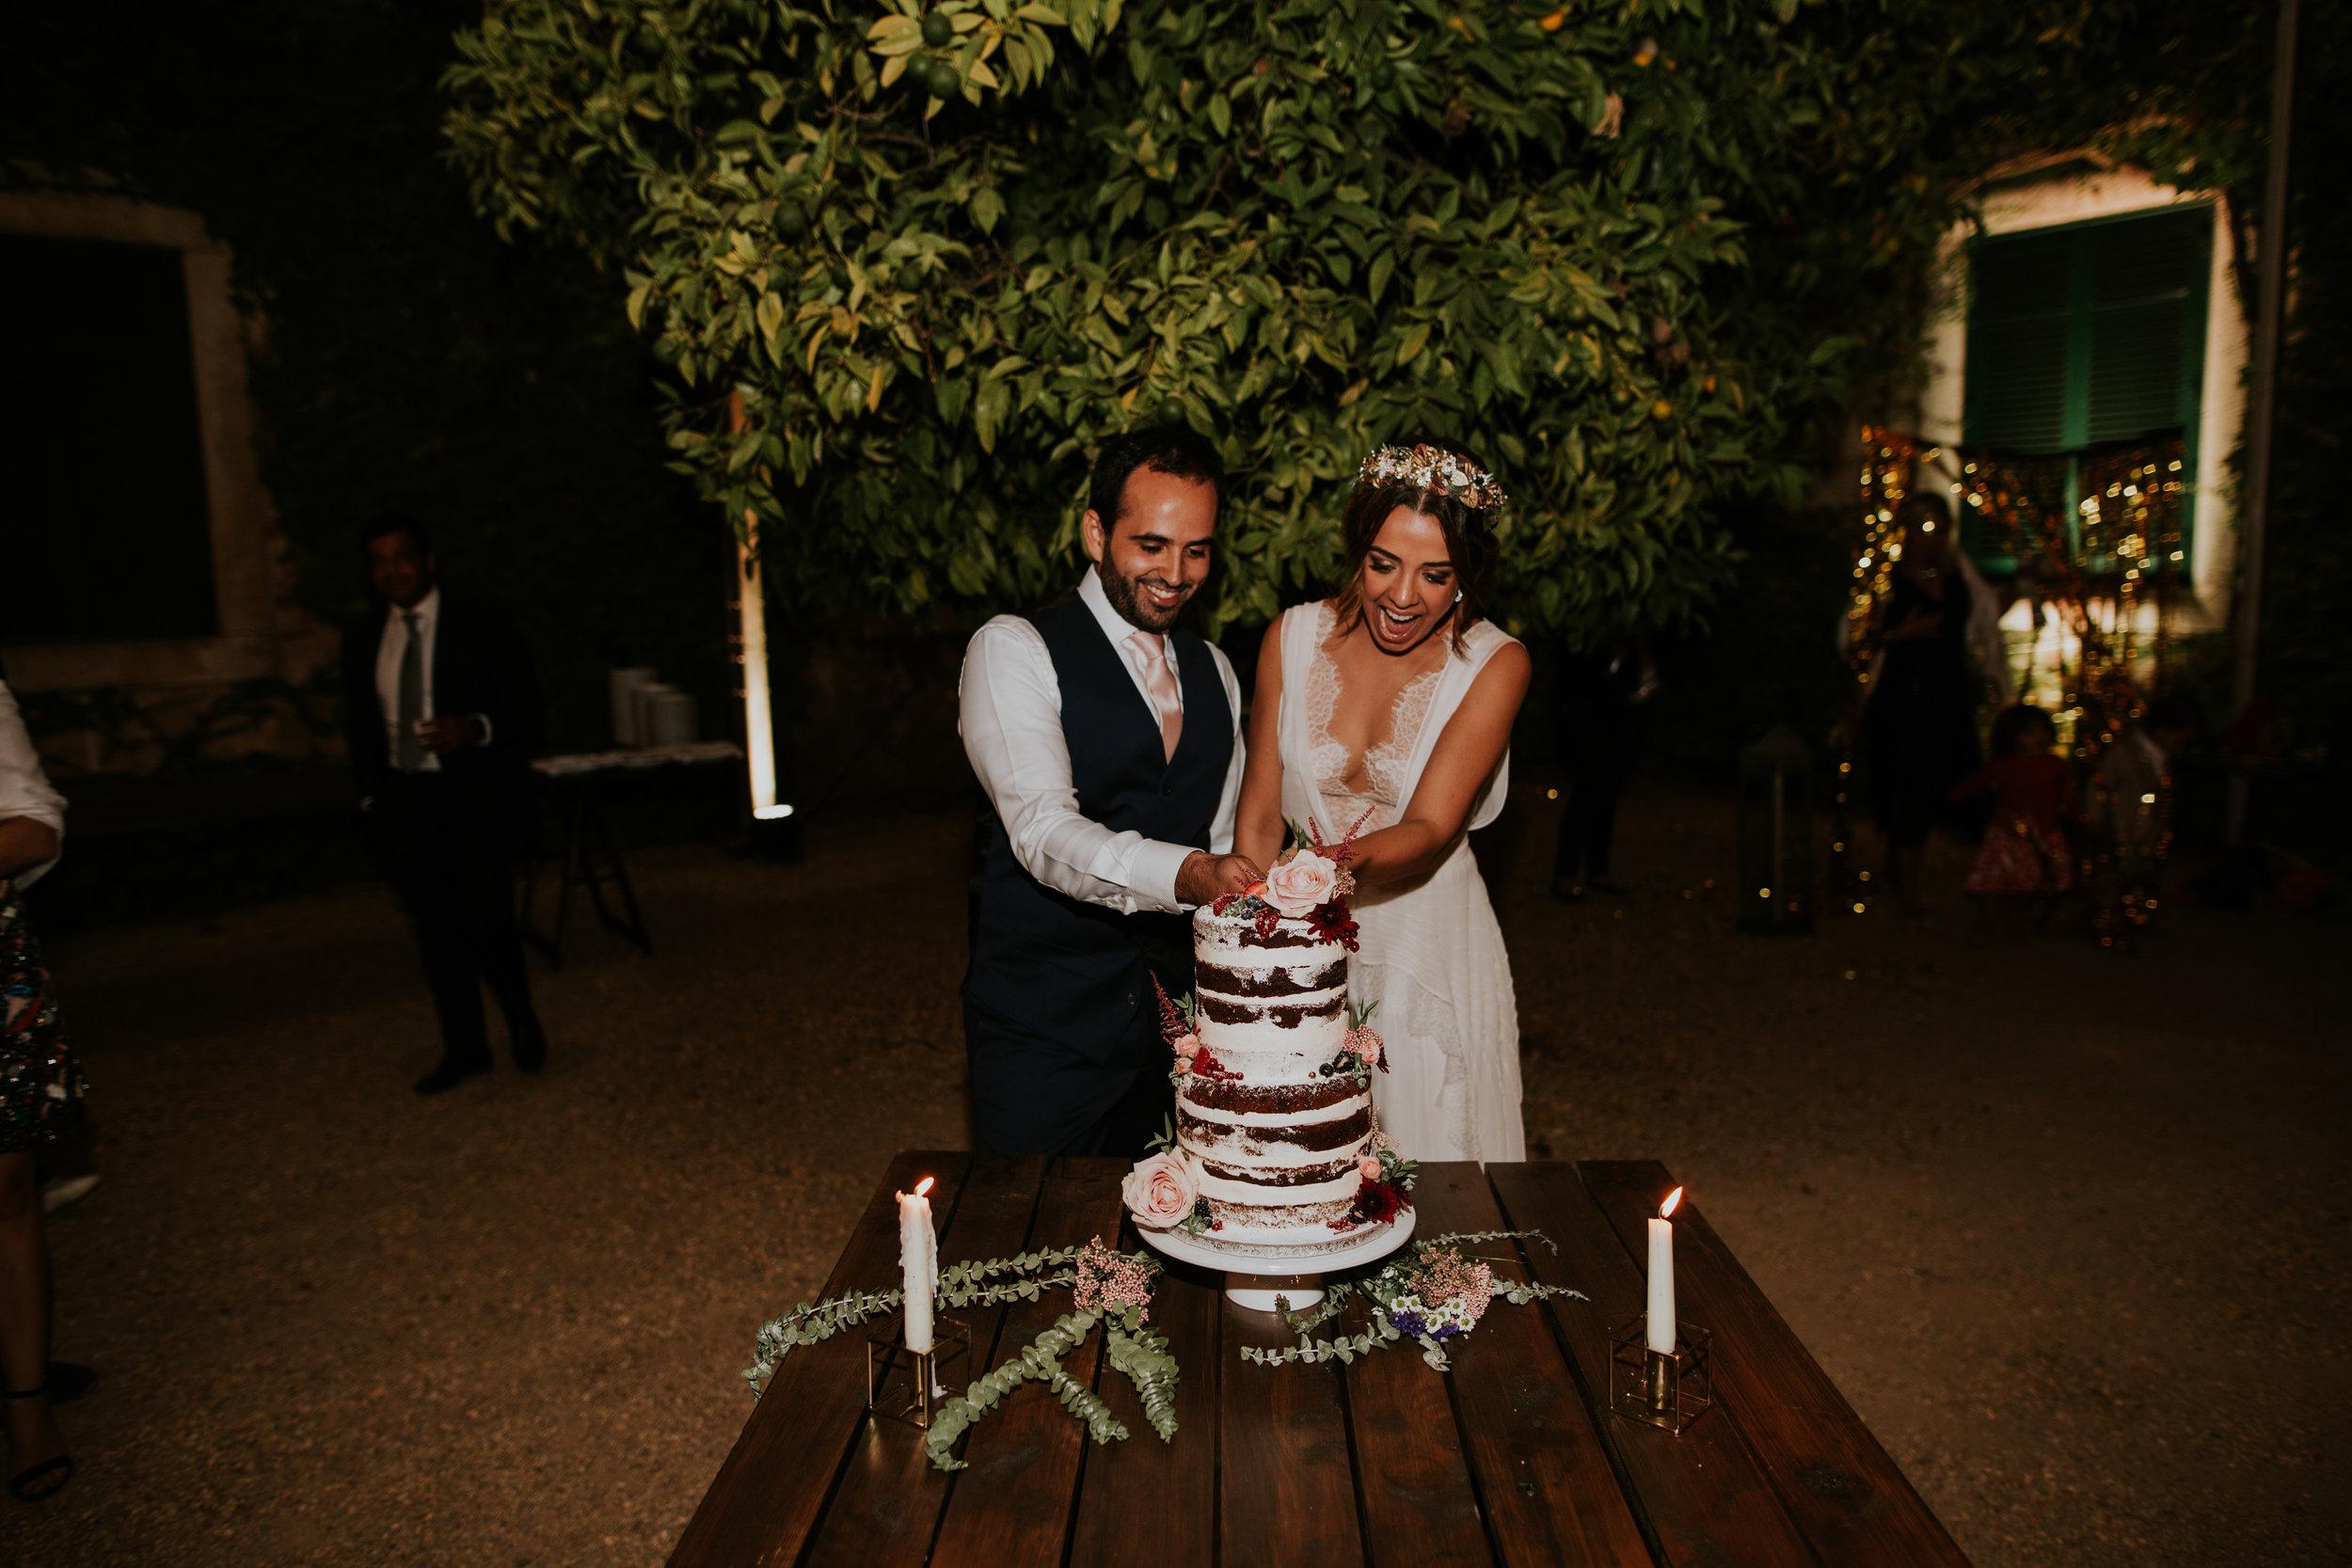 R&J881_ 09 setembro 2017 Wedding day_.jpg